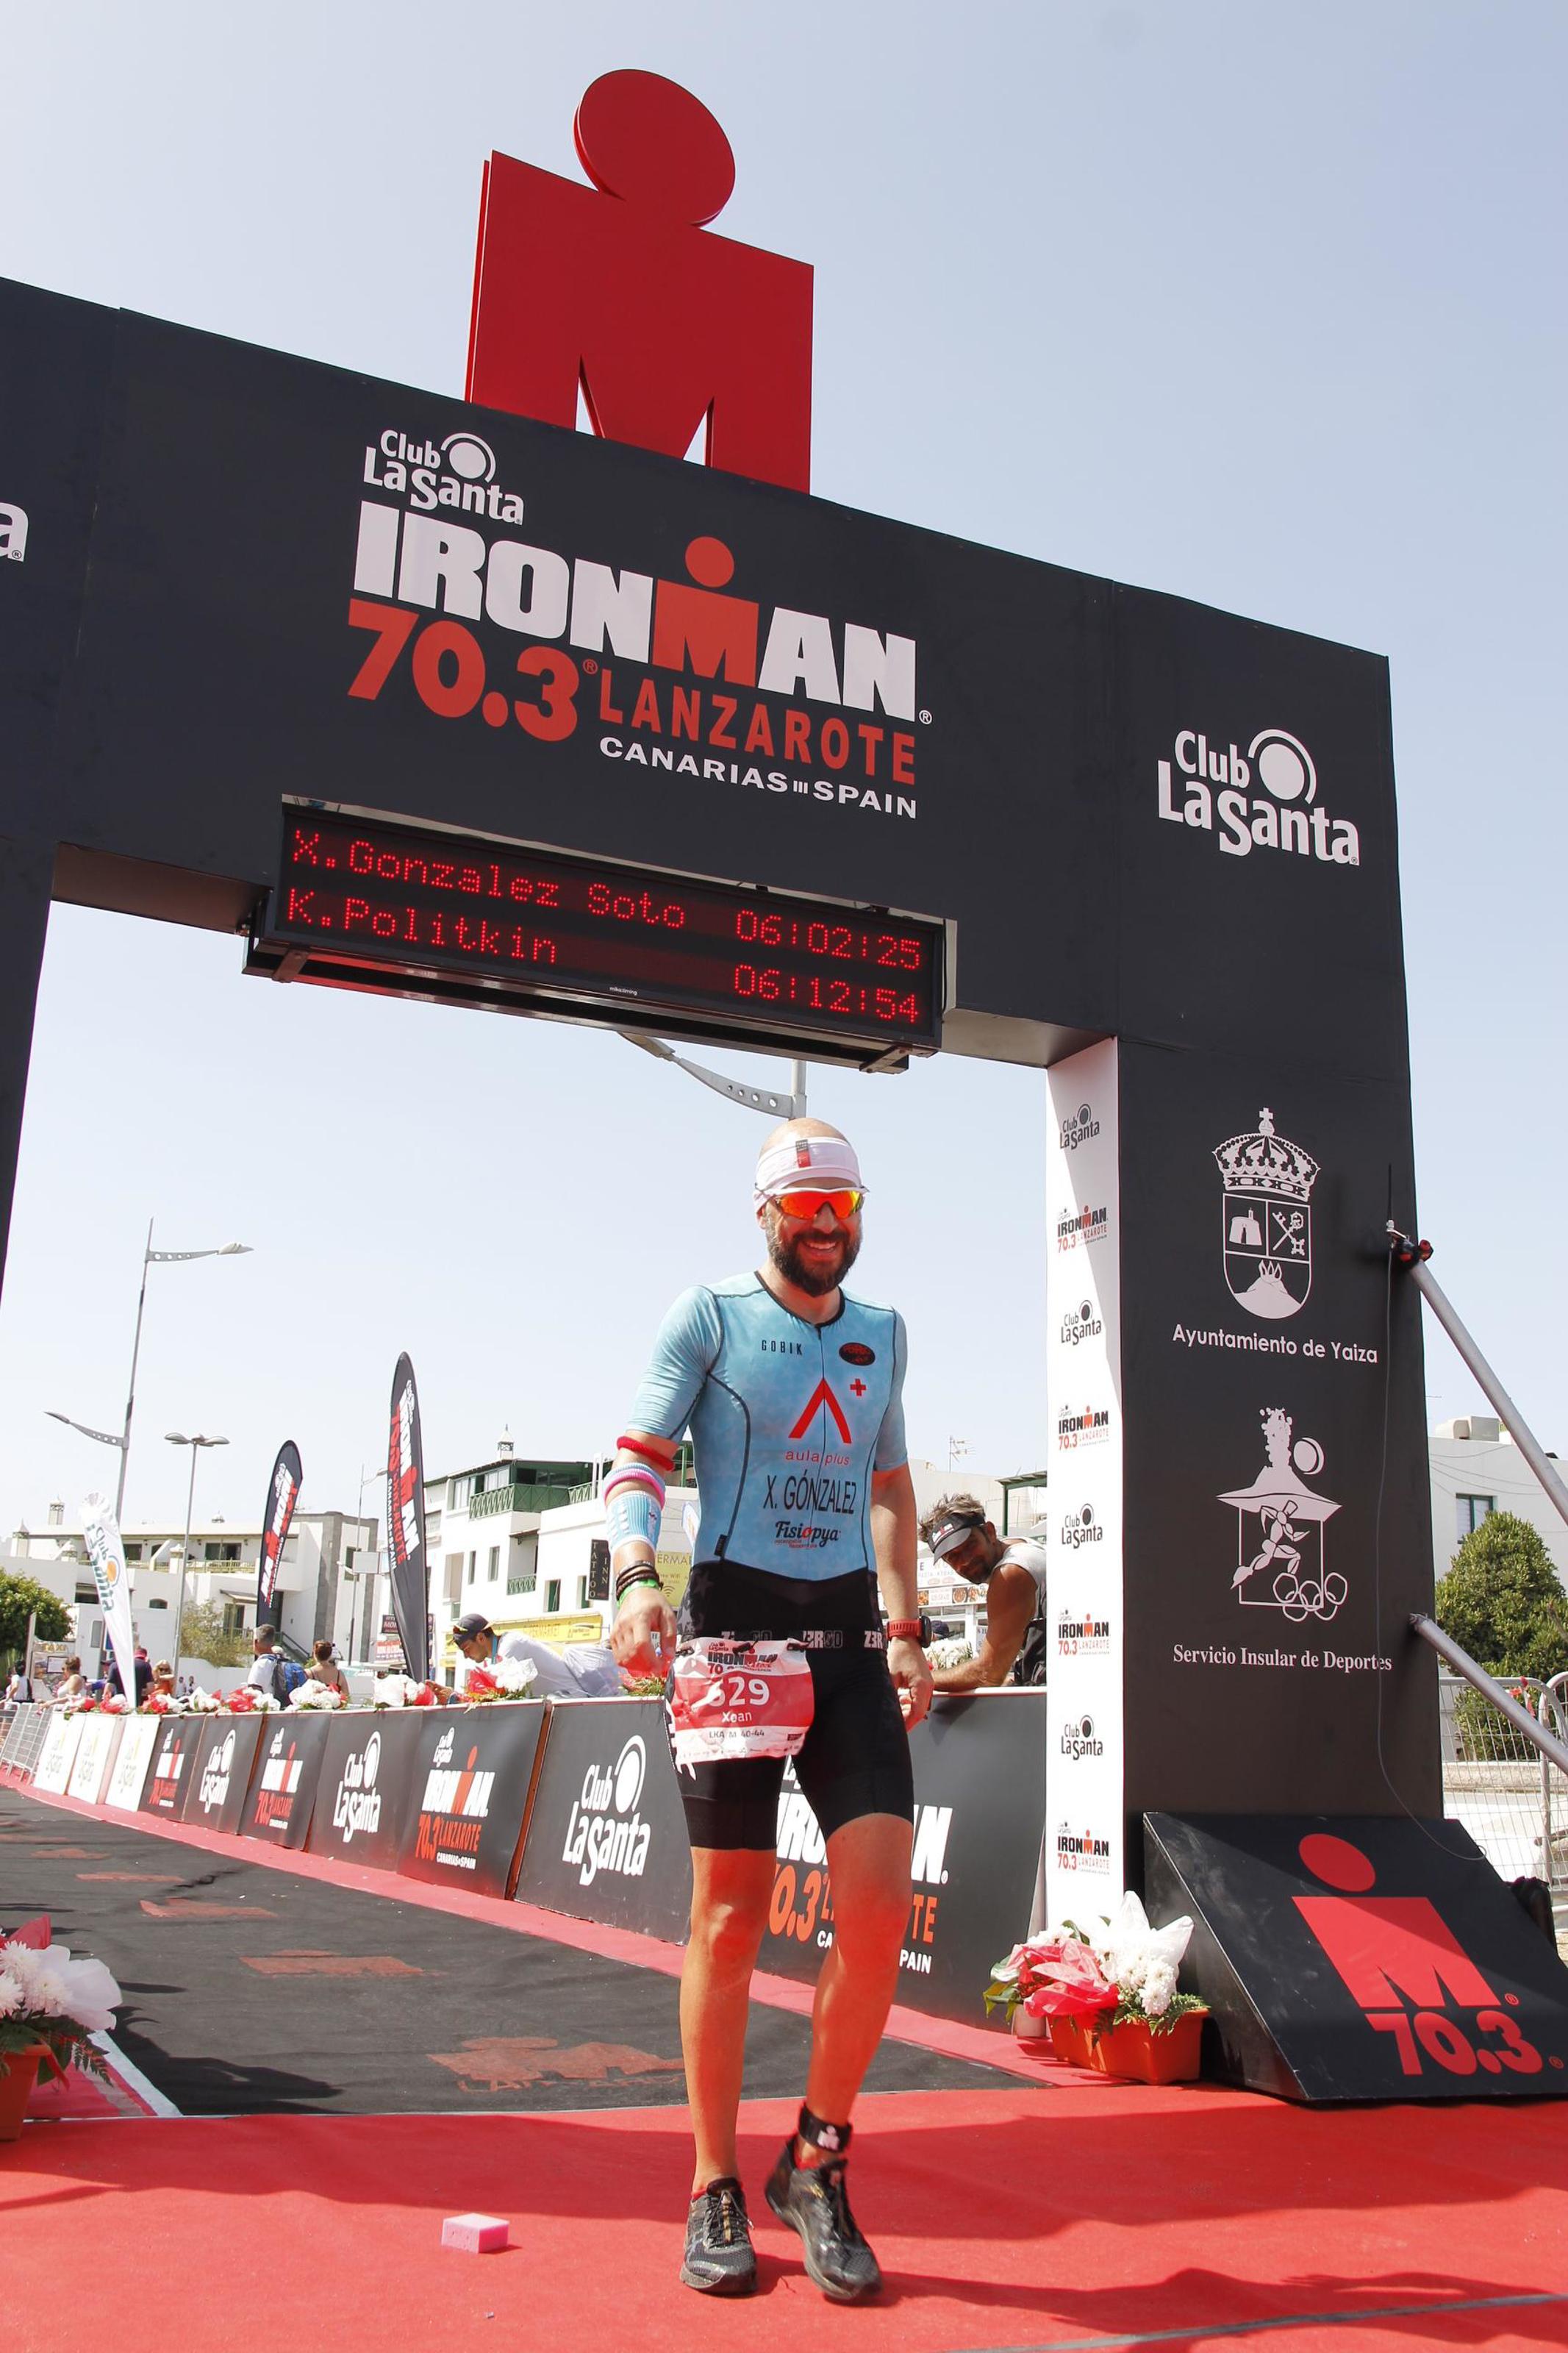 70.3 Ironman Lanzarote 2019